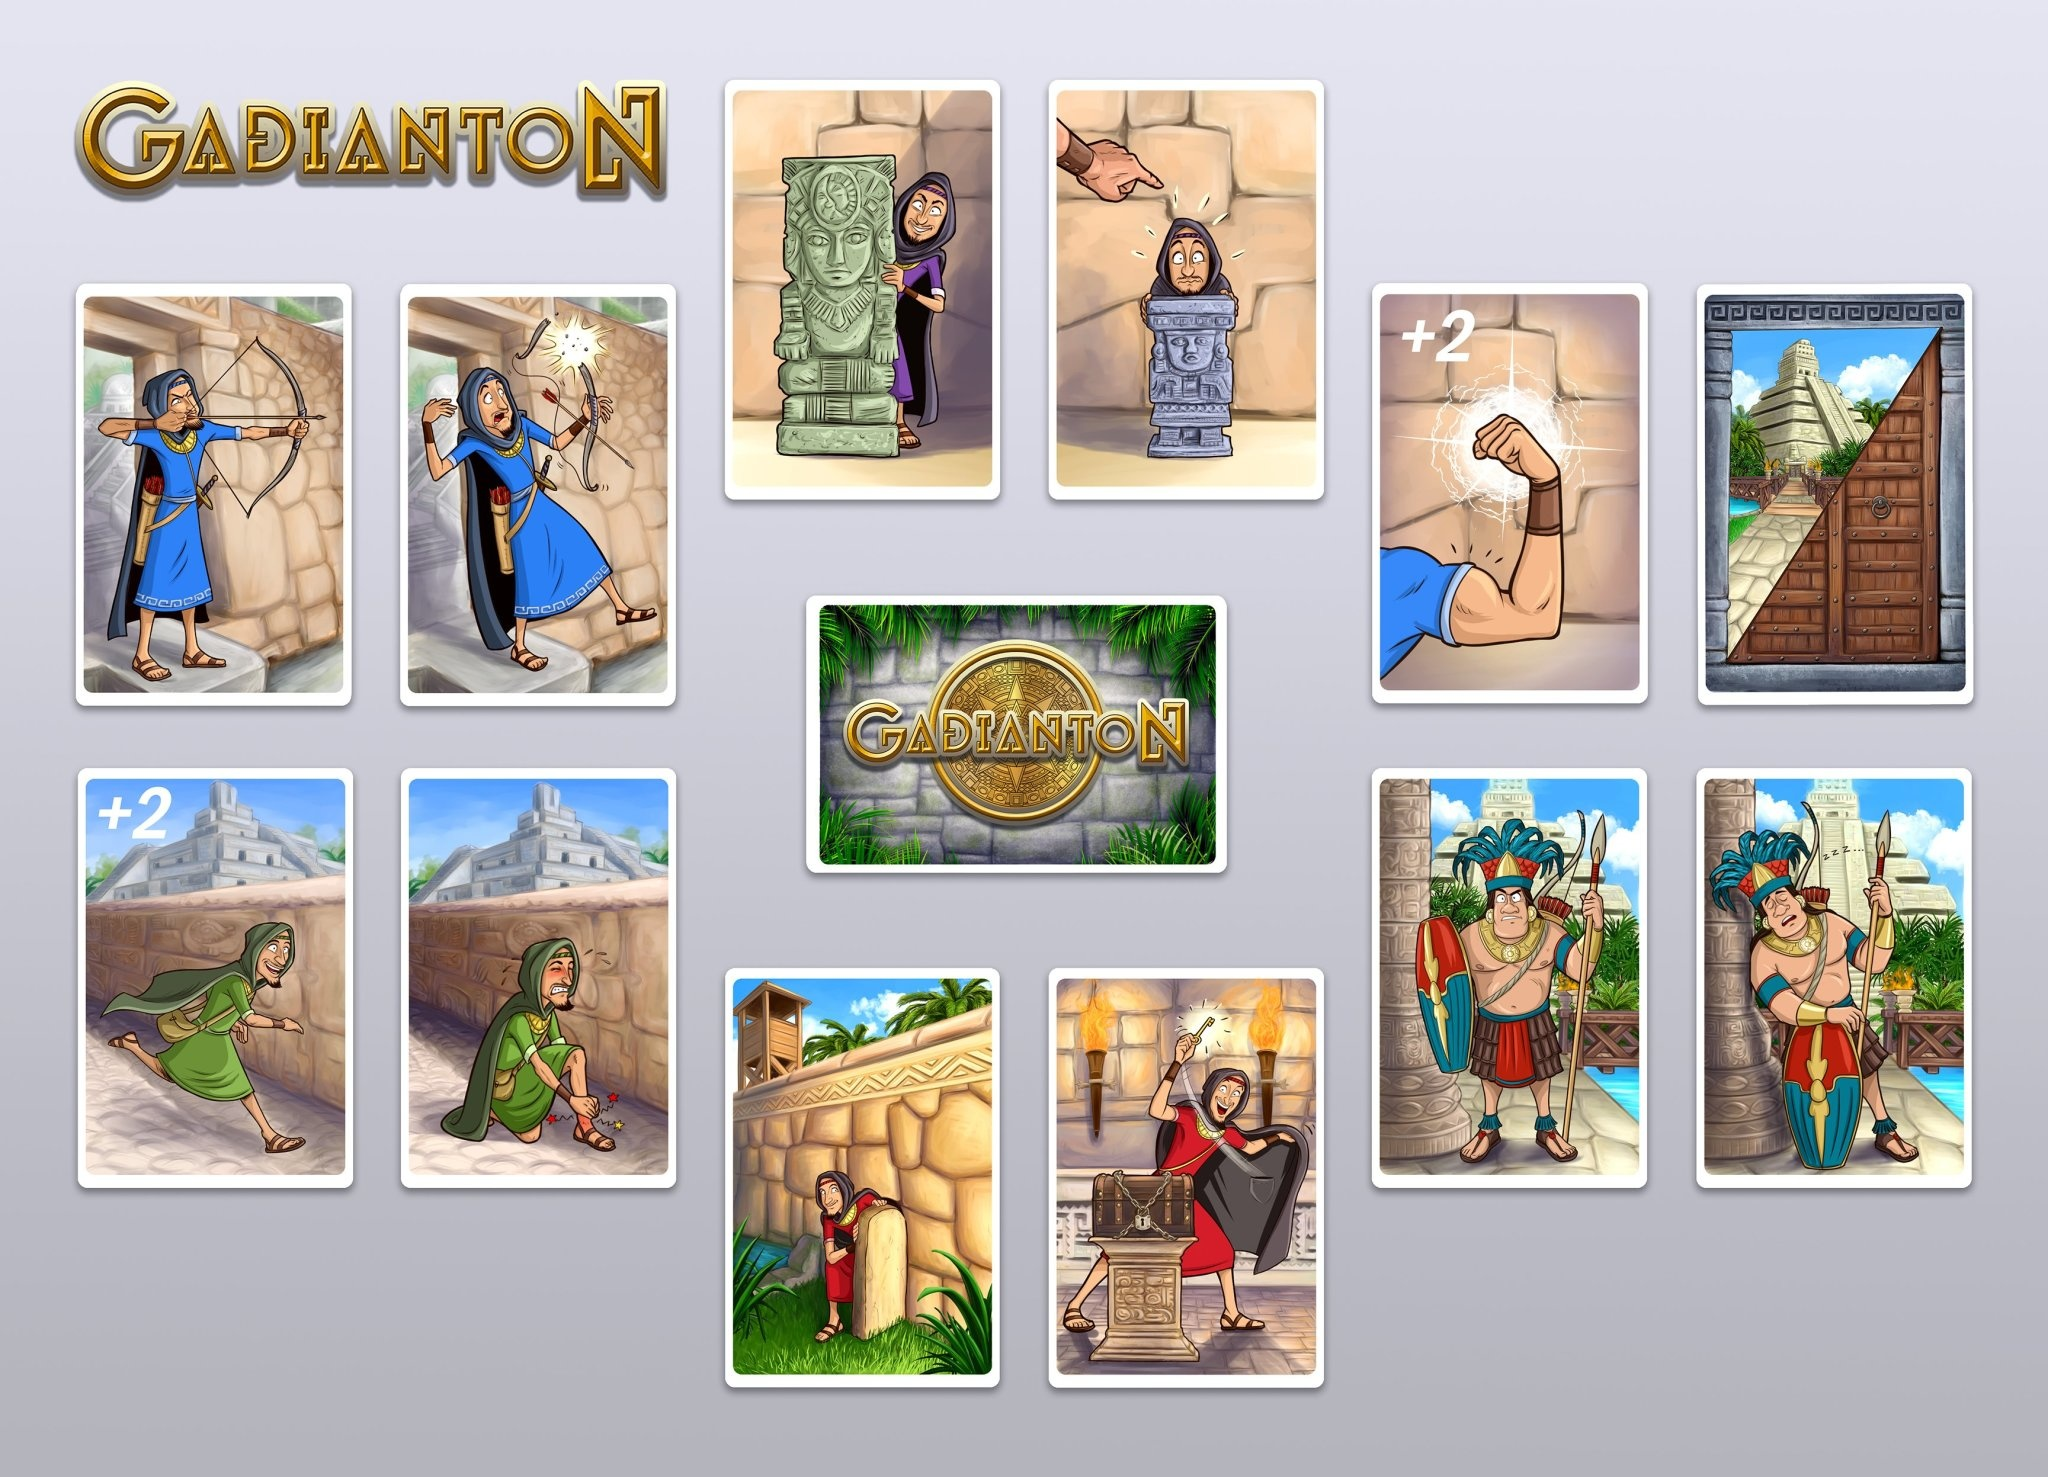 GADIANTON THE GAME